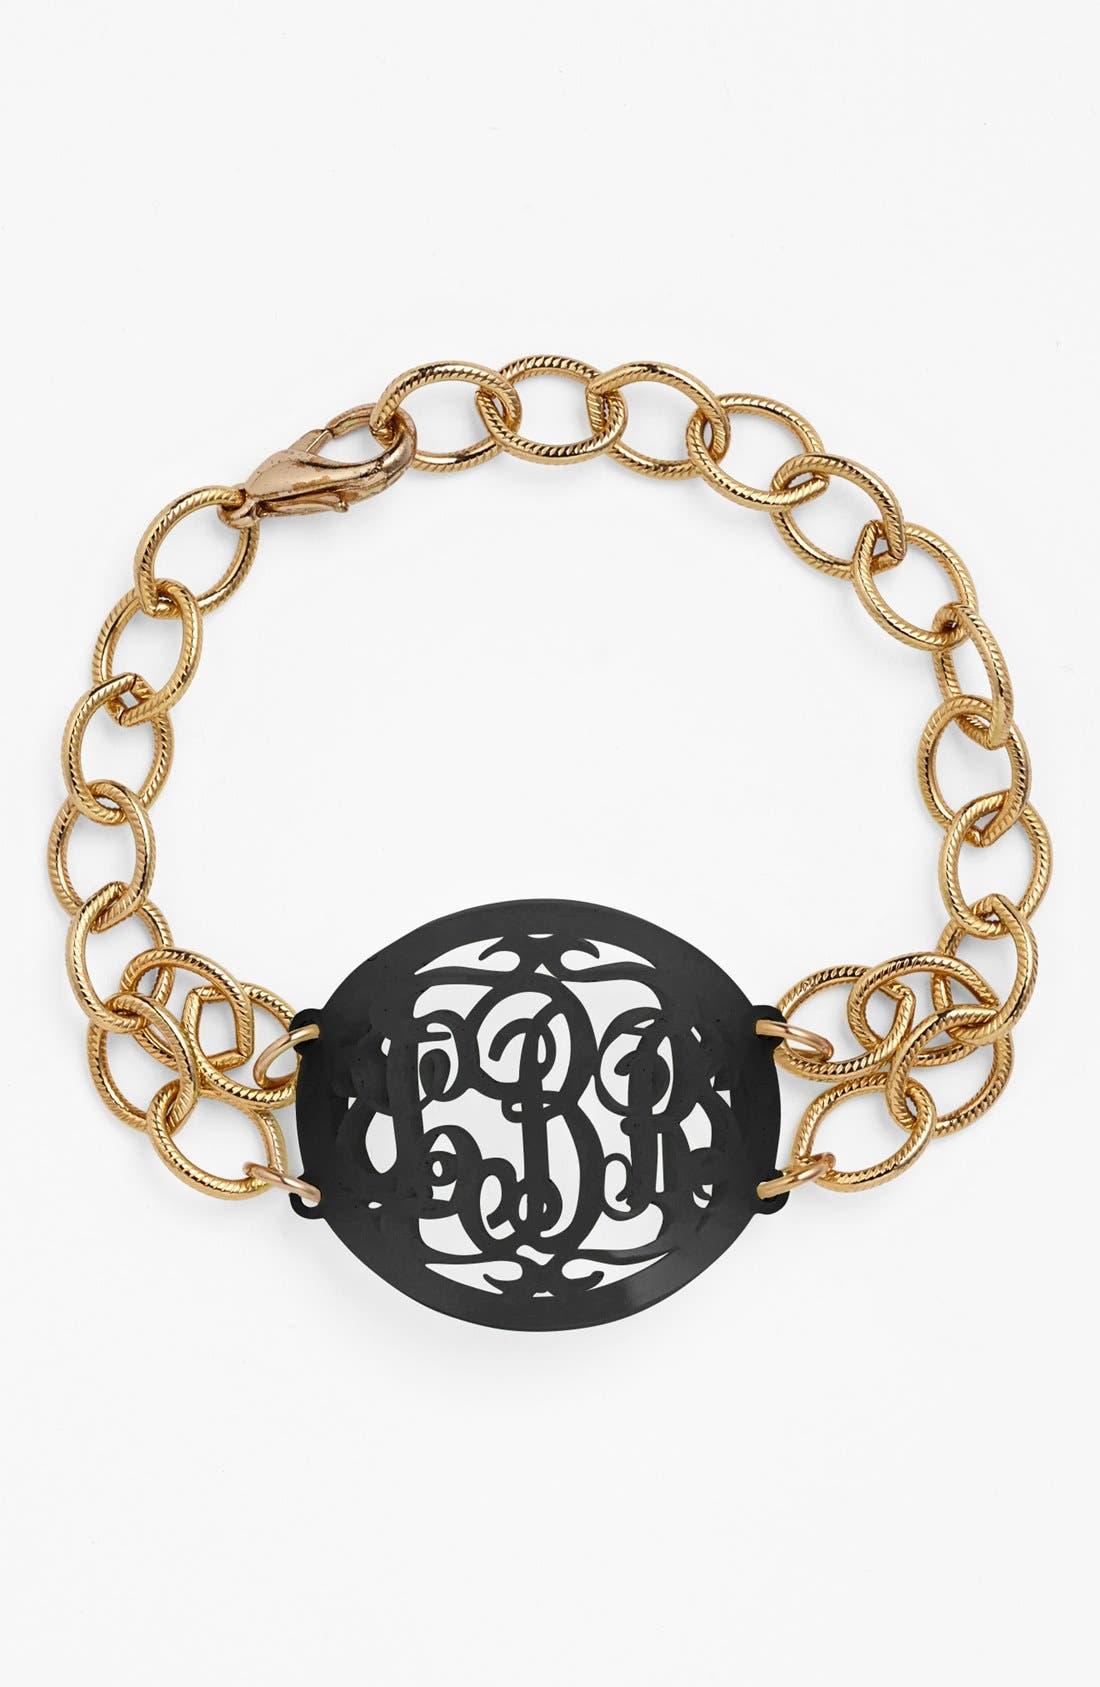 MOON AND LOLA, 'Annabel' Medium Oval Personalized Monogram Bracelet, Main thumbnail 1, color, EBONY/ GOLD